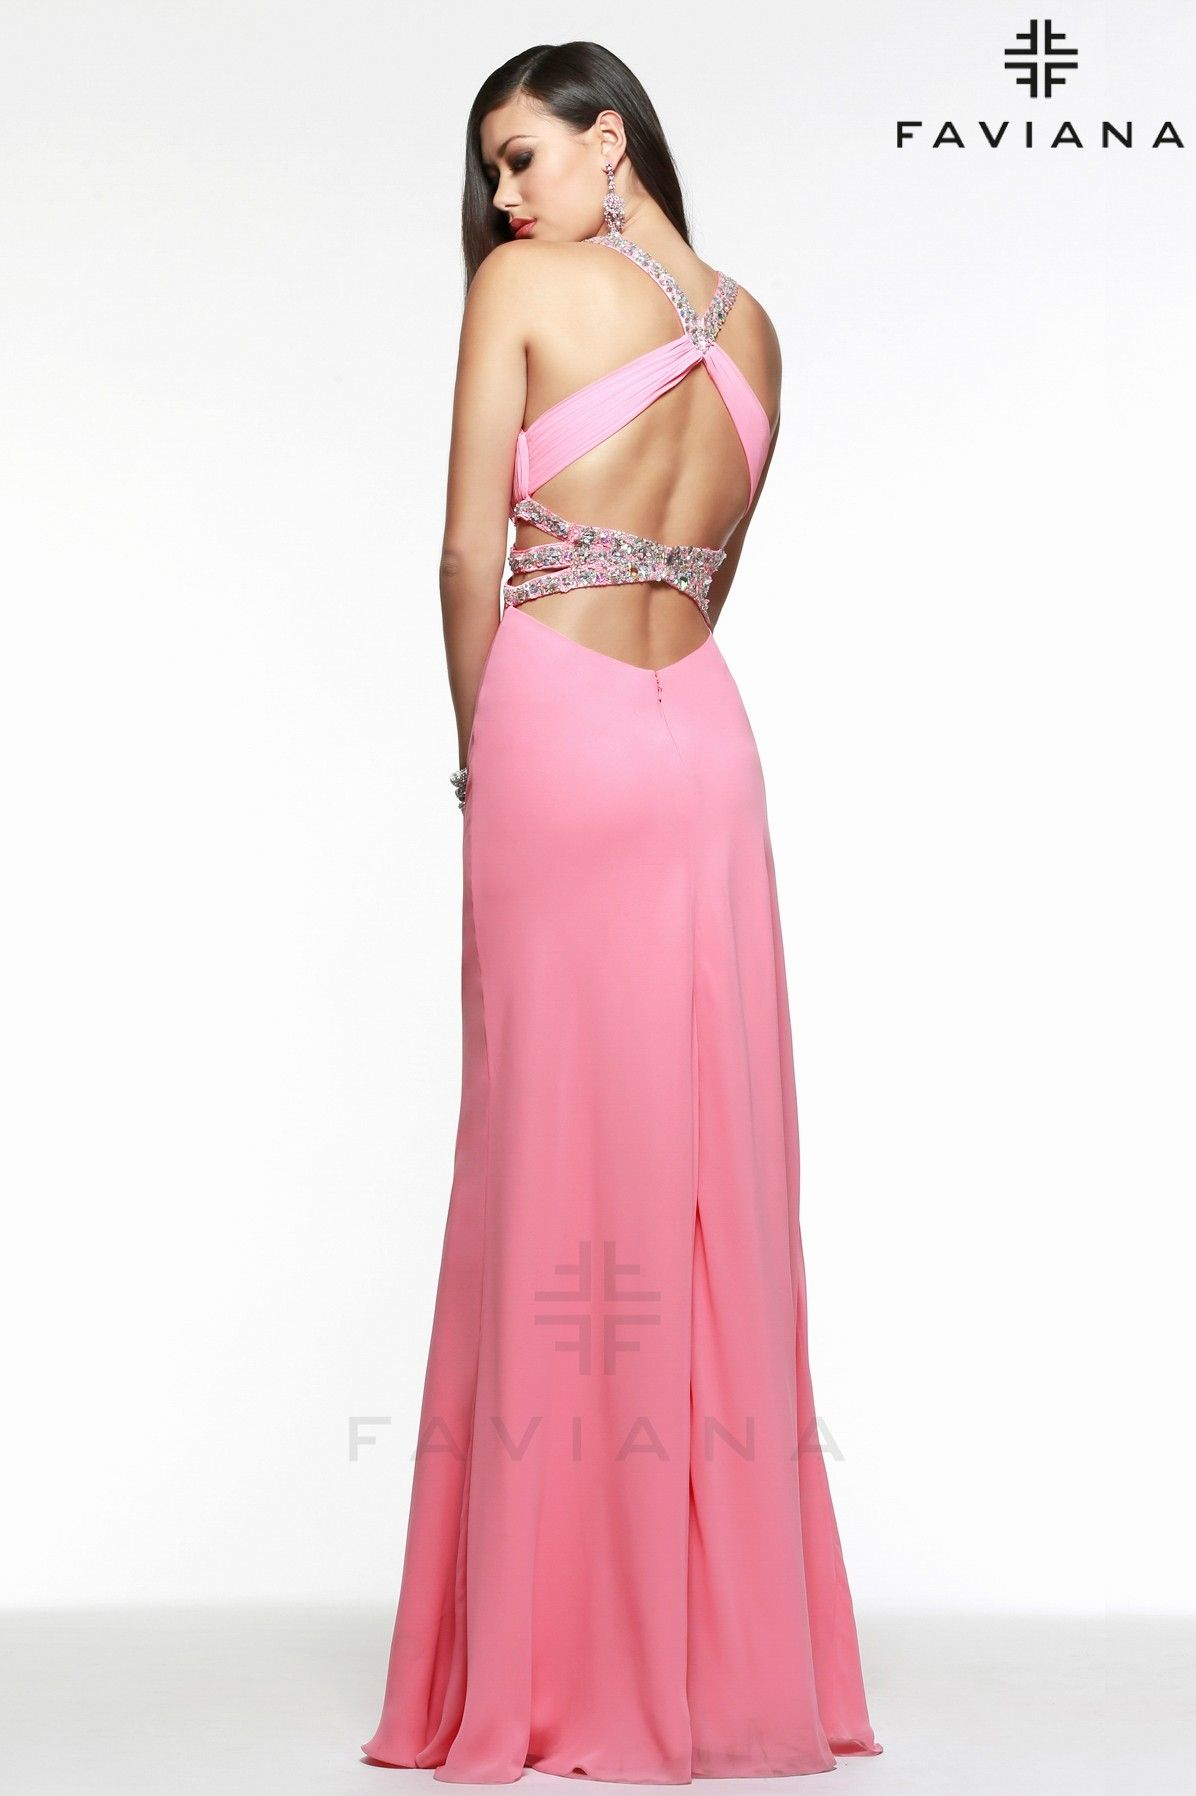 Asombroso Vestidos De Fiesta Pa Allentown Ideas Ornamento ...